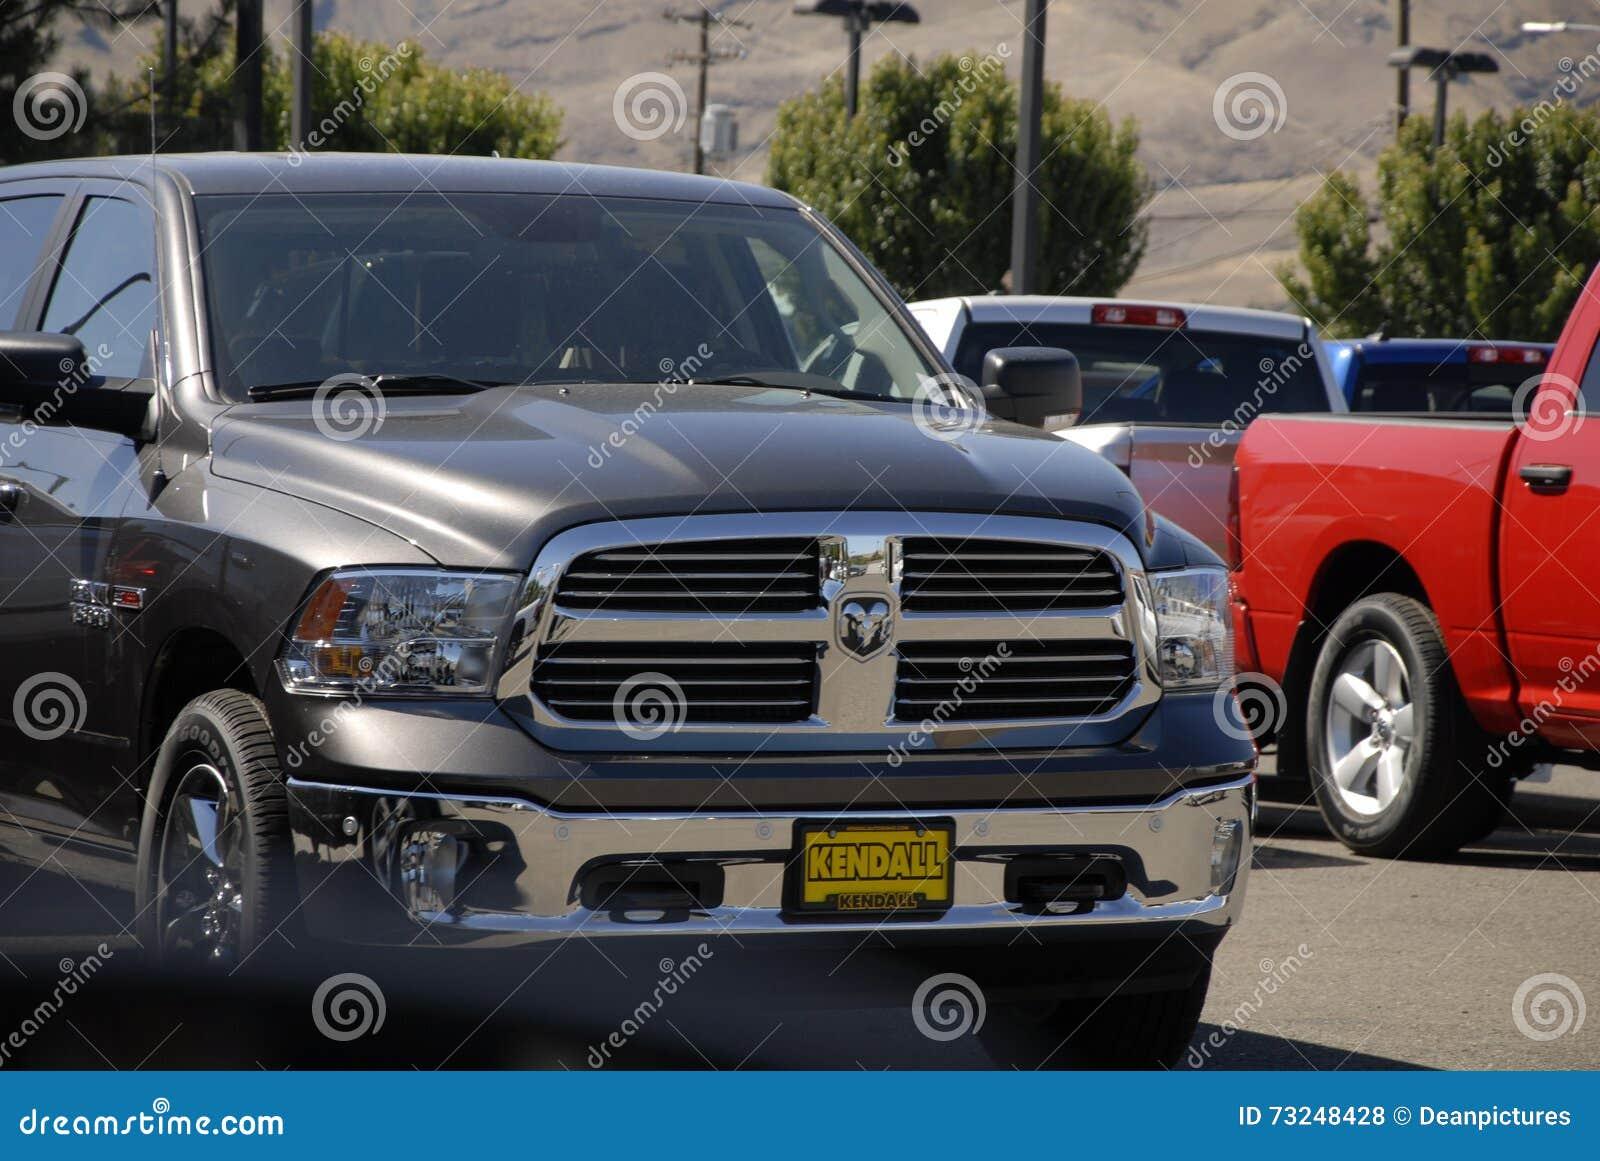 Dodge Ram Pickups Editorial Stock Photo Image Of Dealer 73248428